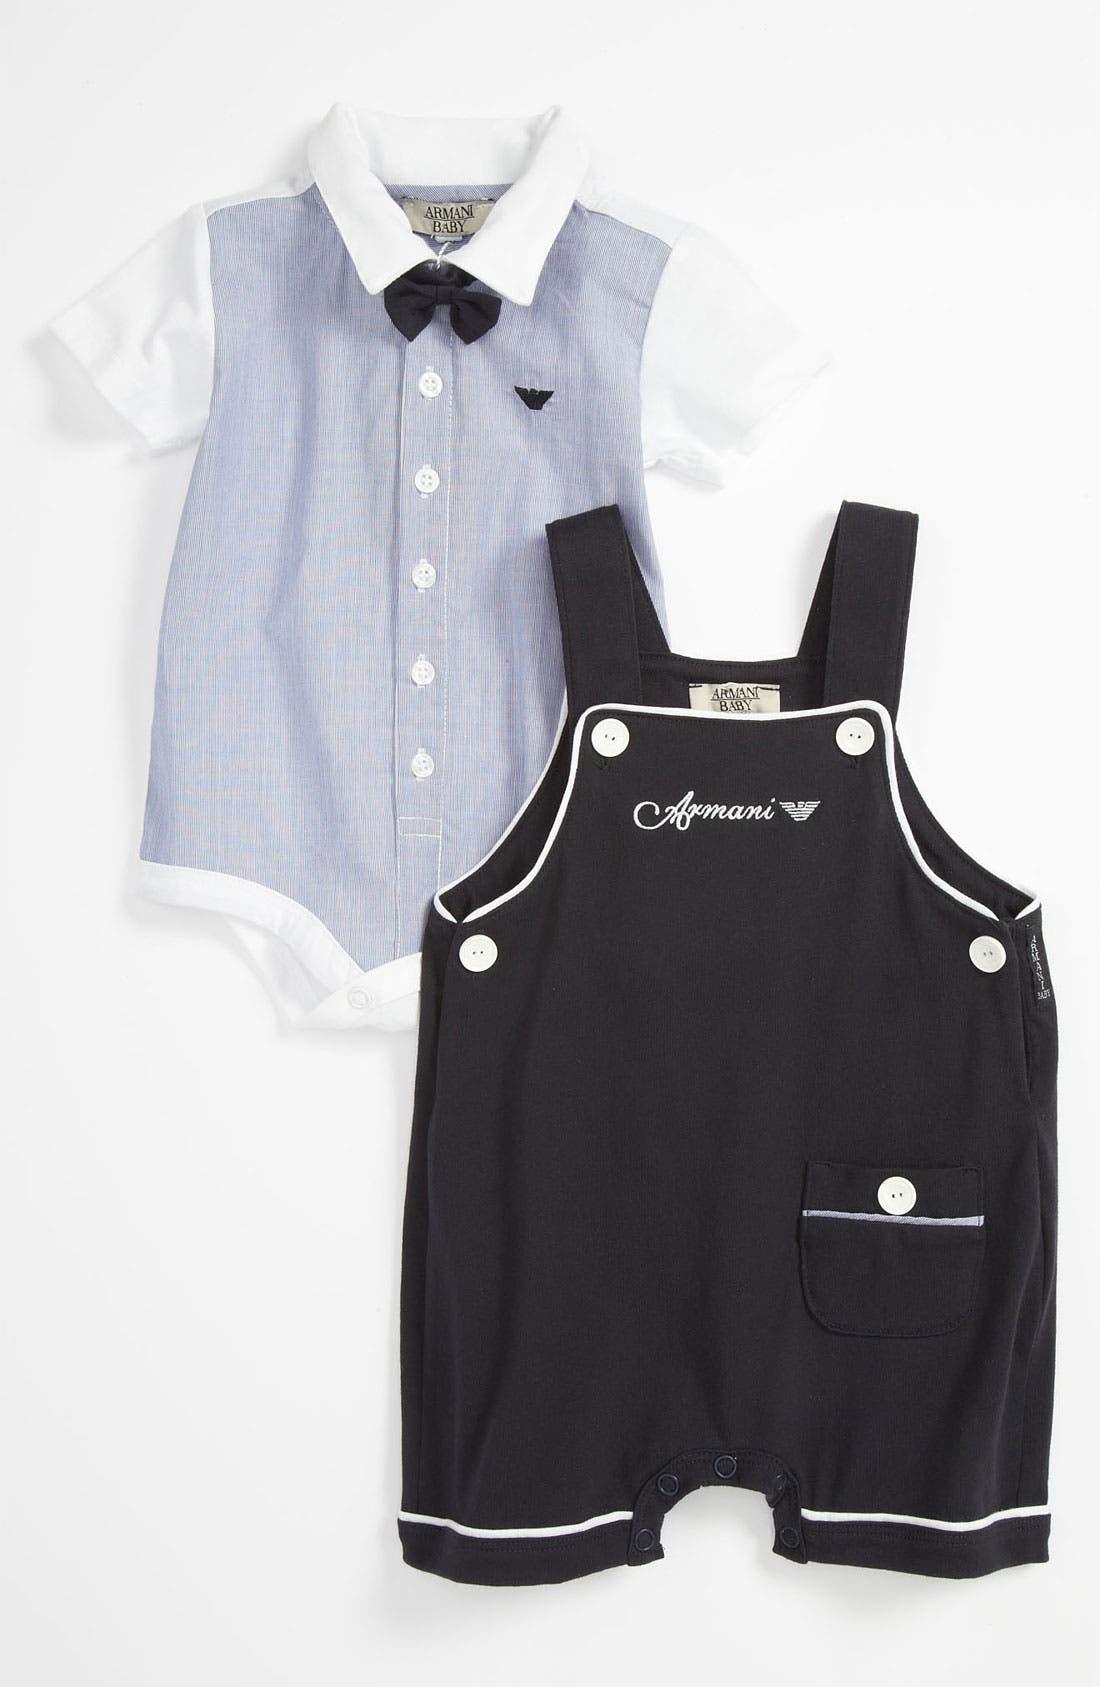 Main Image - Armani Junior Bodysuit, Overalls & Bow Tie (Infant)